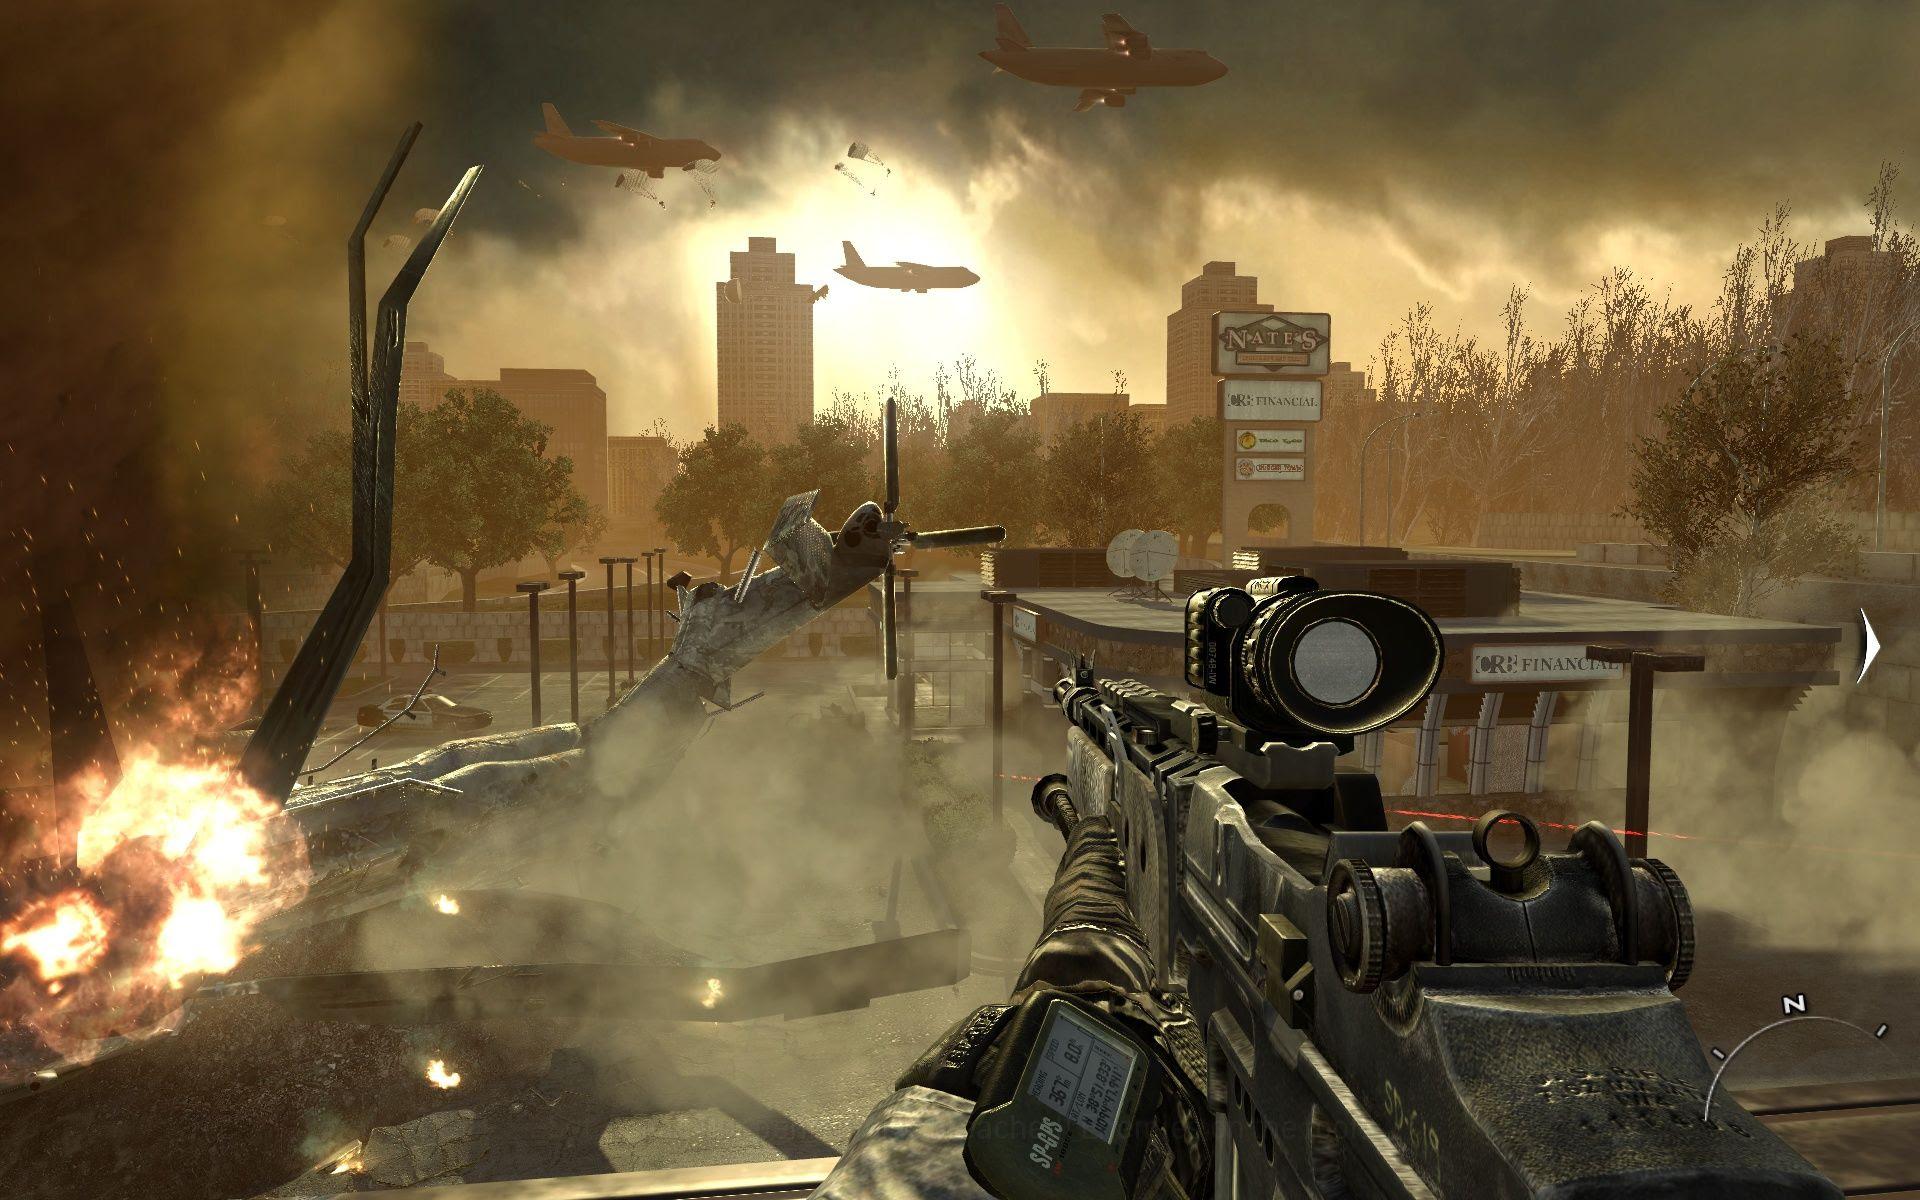 Call Of Duty Modern Warfare 2 Wallpaper 1920x1200 67354